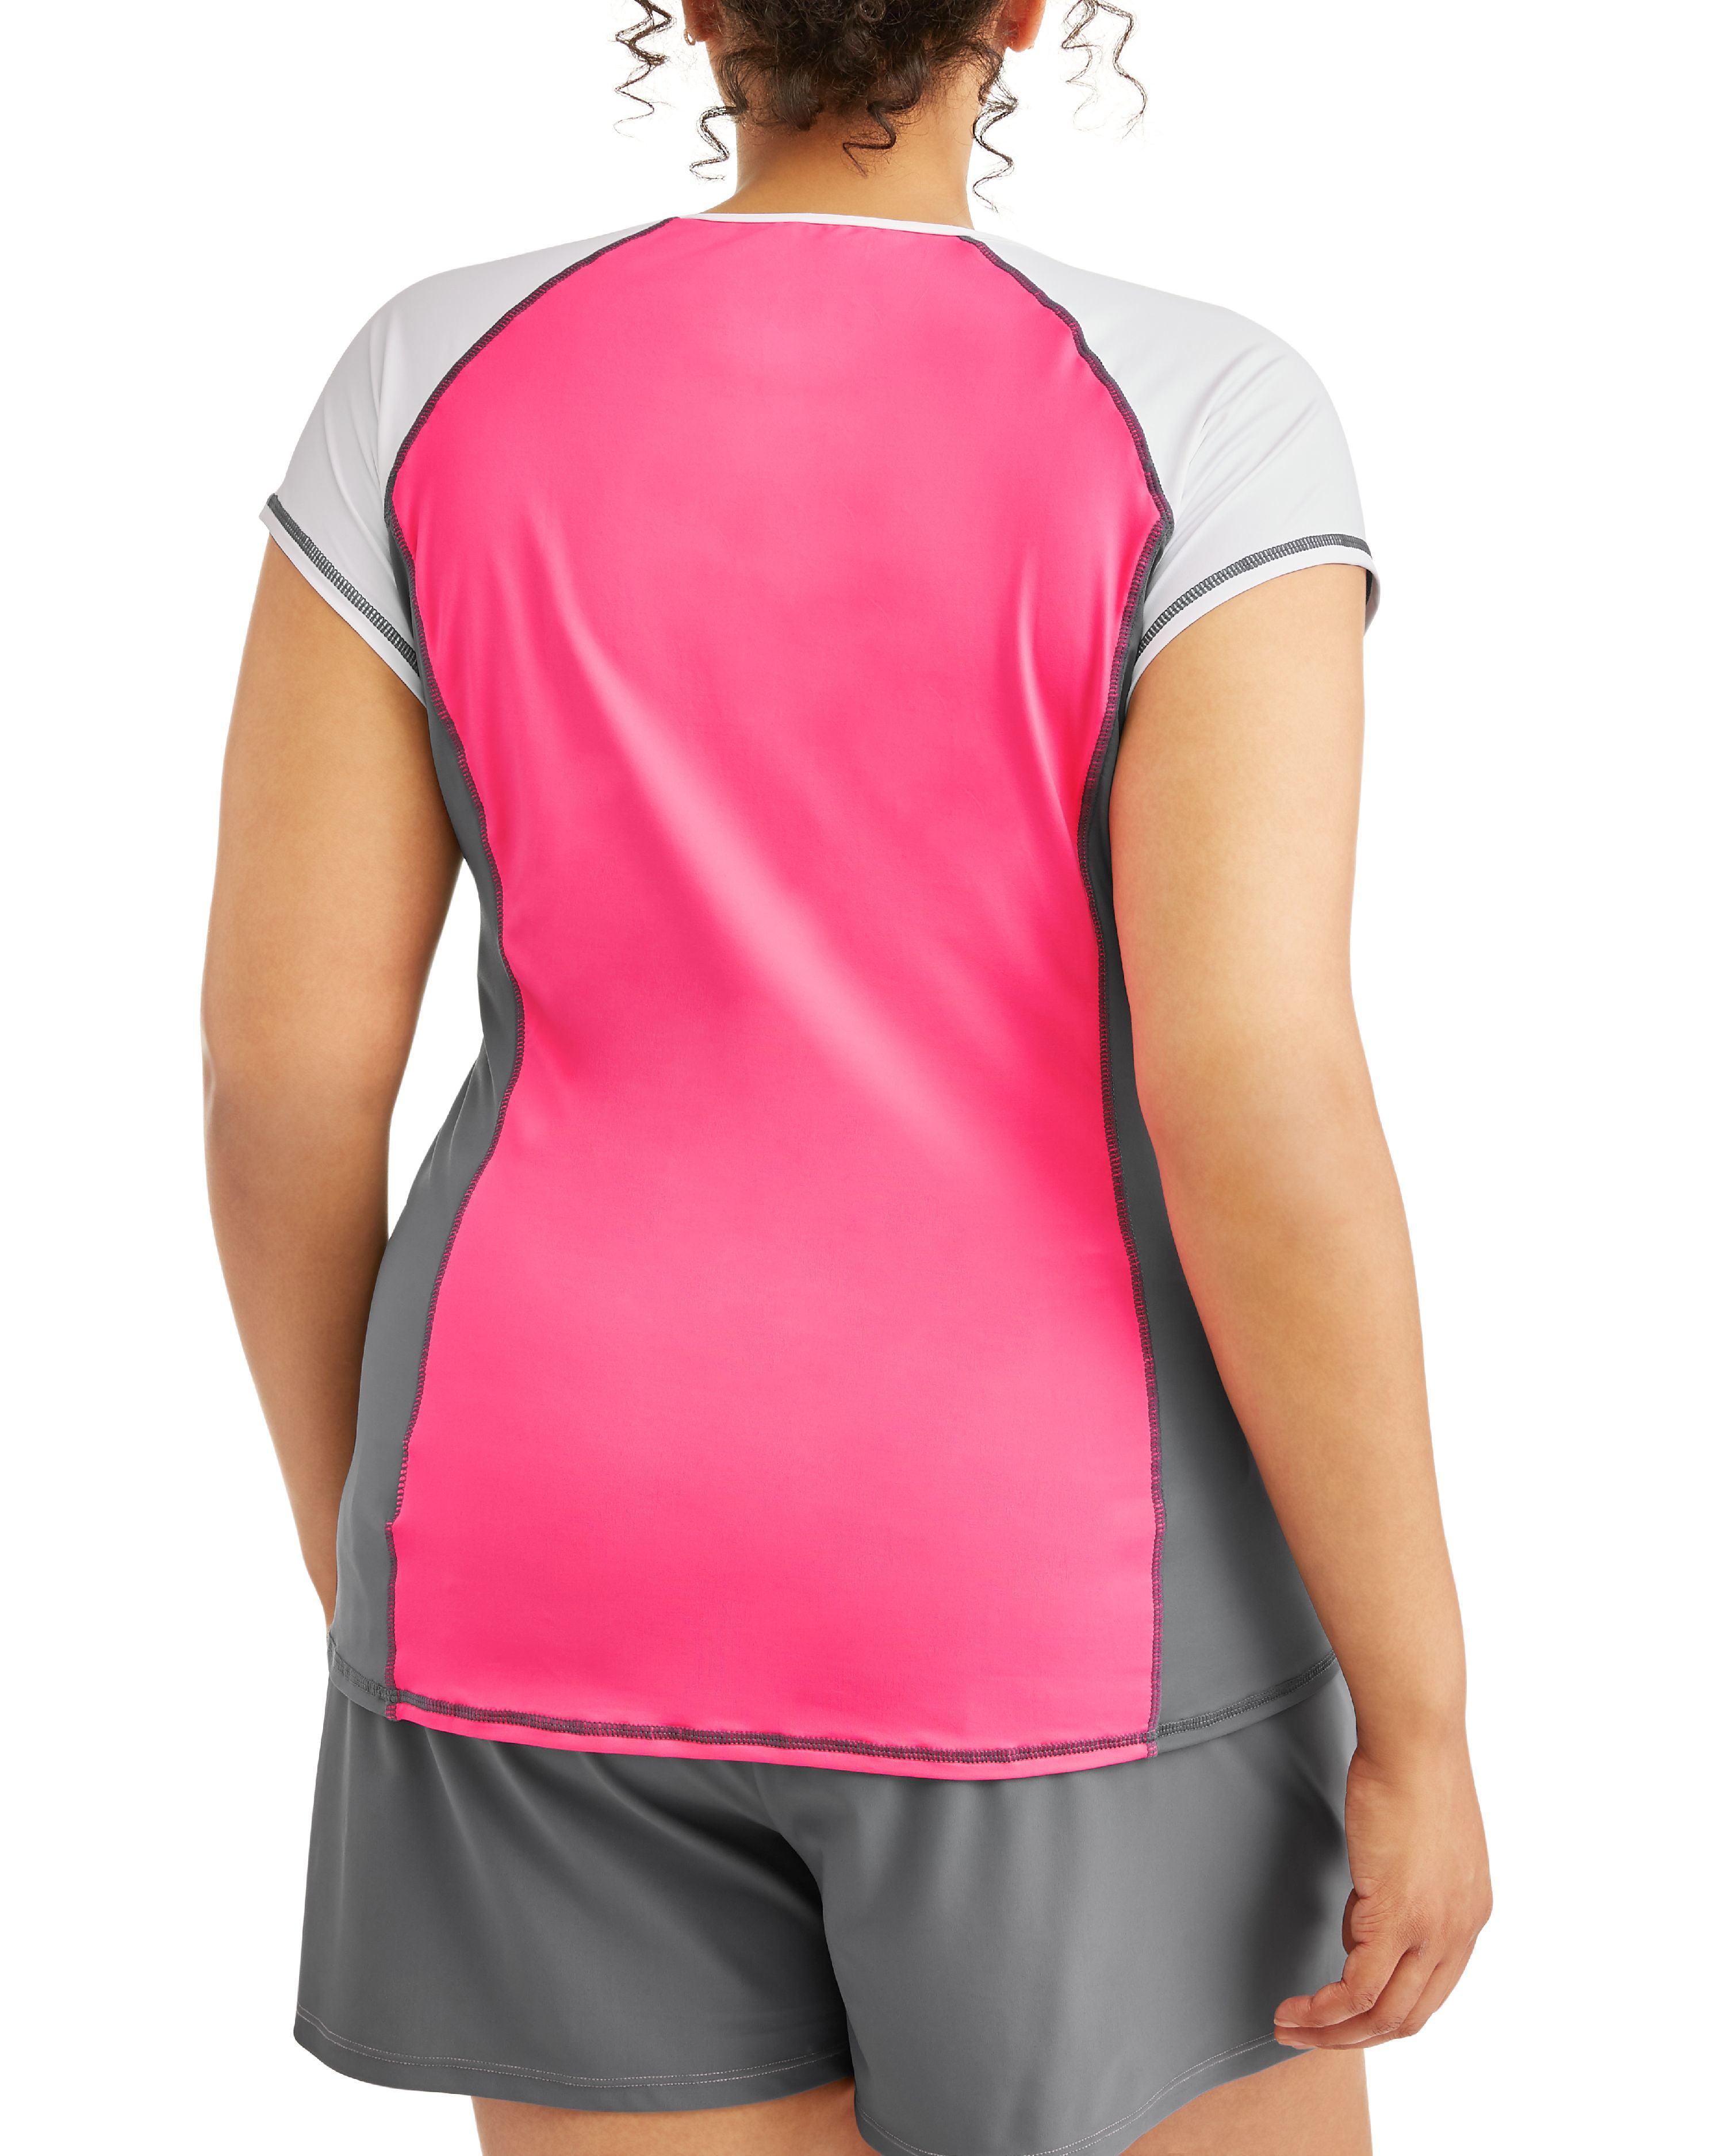 8277e0e038 Free Tech - Women s Plus-Size Sporty Colorblock Rashguard Swim Cover-Up -  Walmart.com